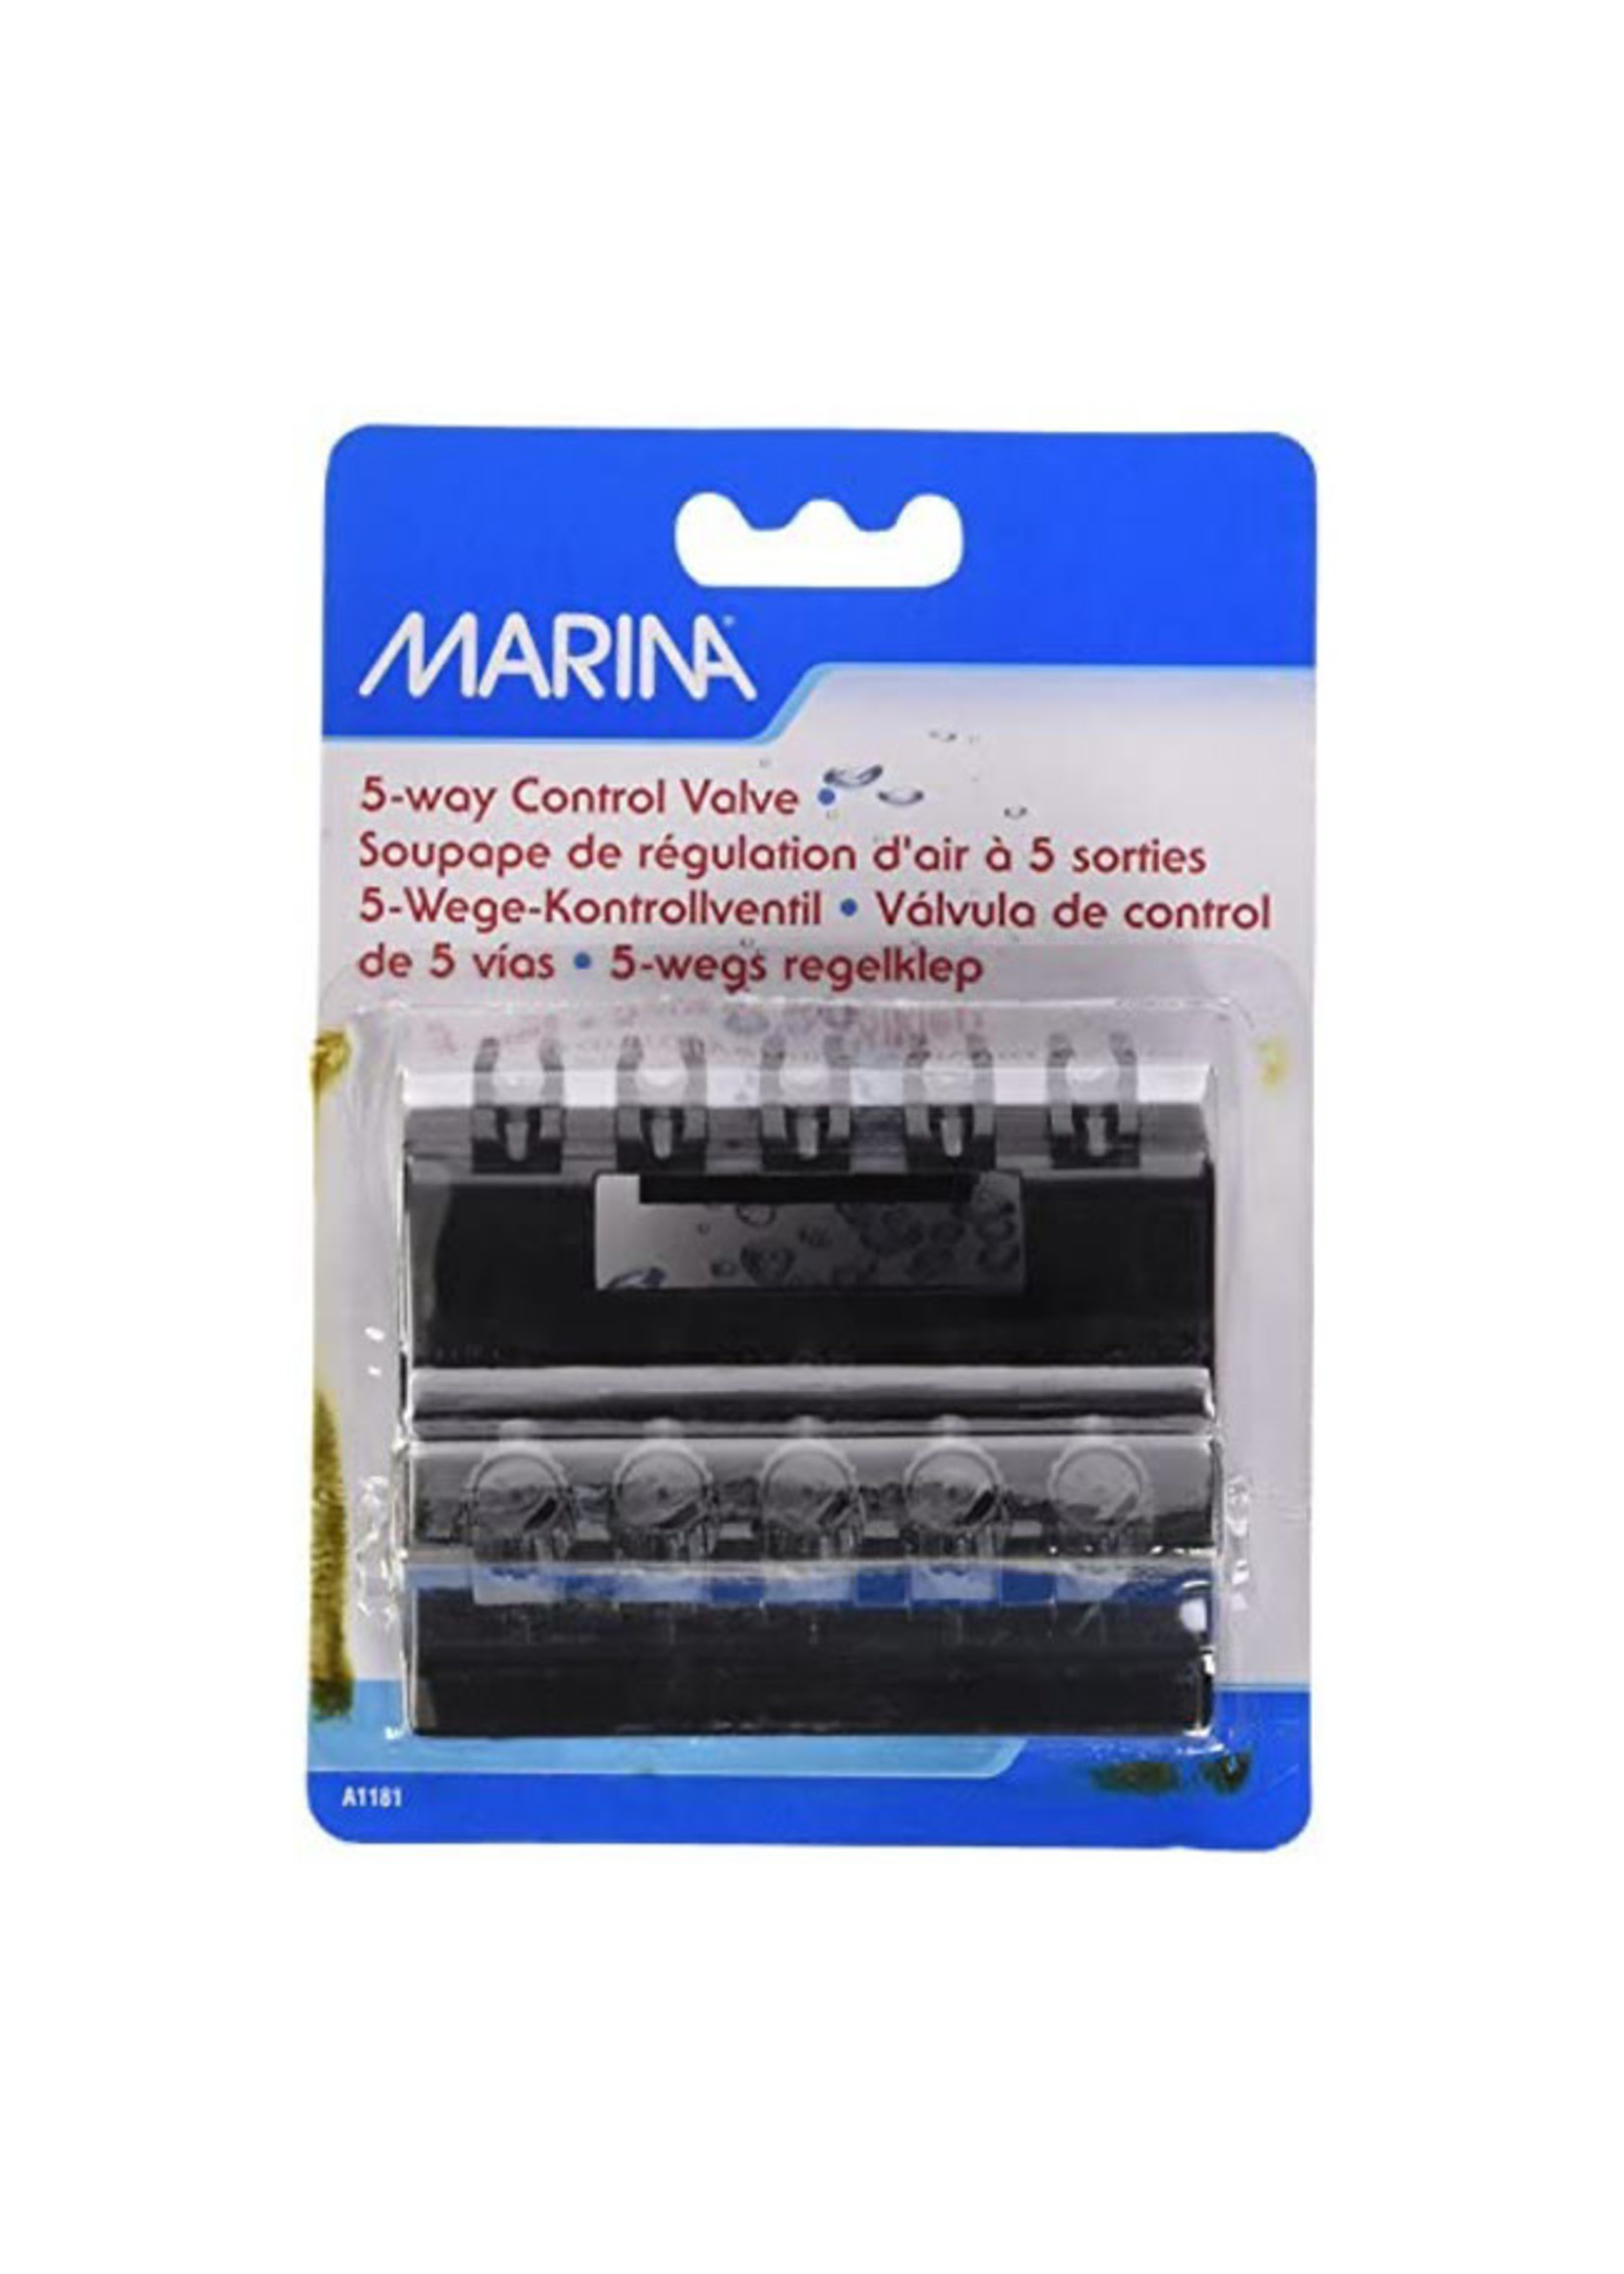 Marina Marina 5-Way Control Valve